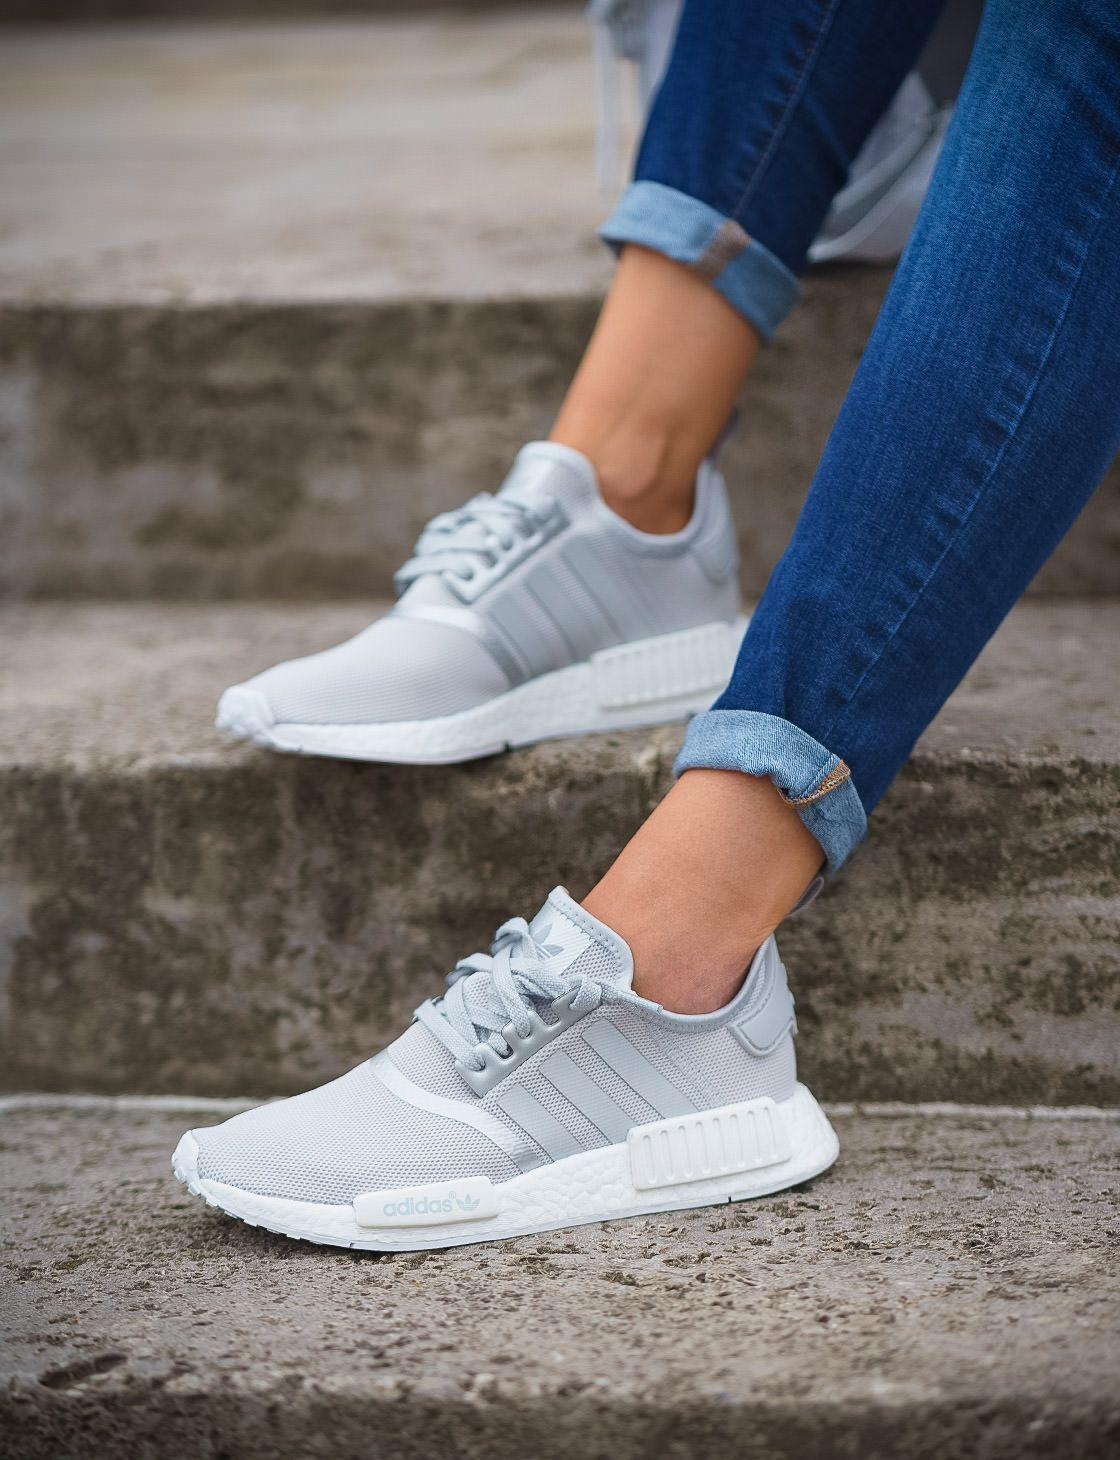 Adidas Schuhe Nmd Weiß